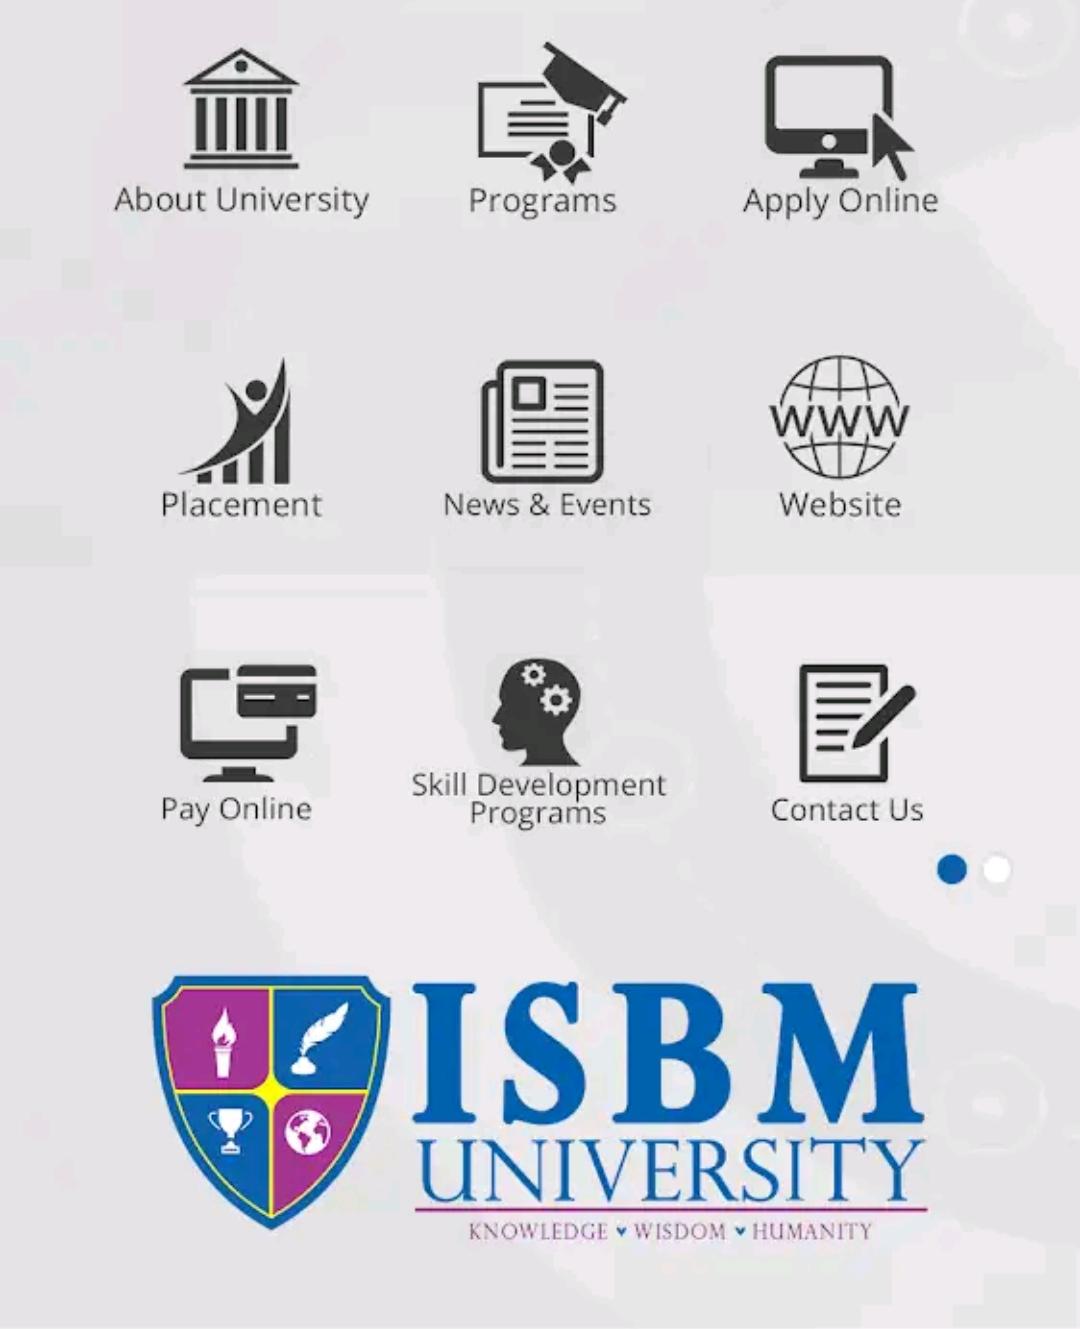 ISBM University Best Private University